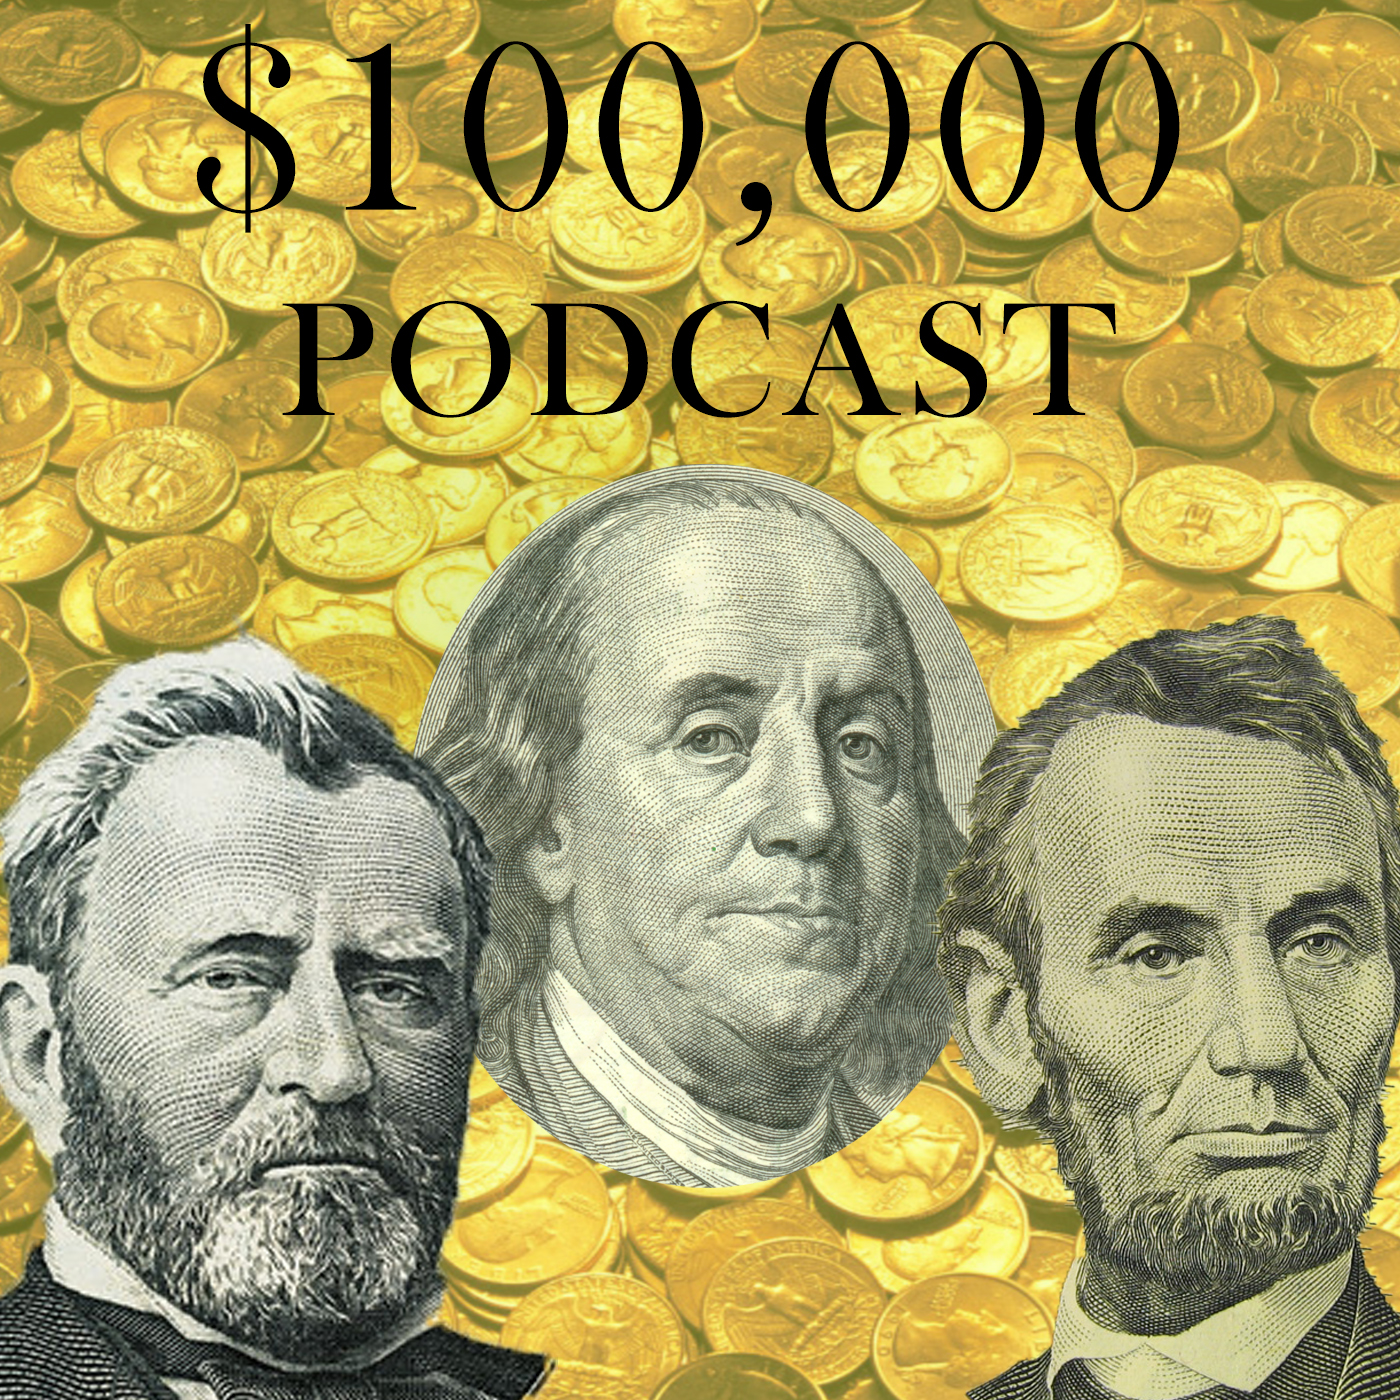 $100,000 Podcast